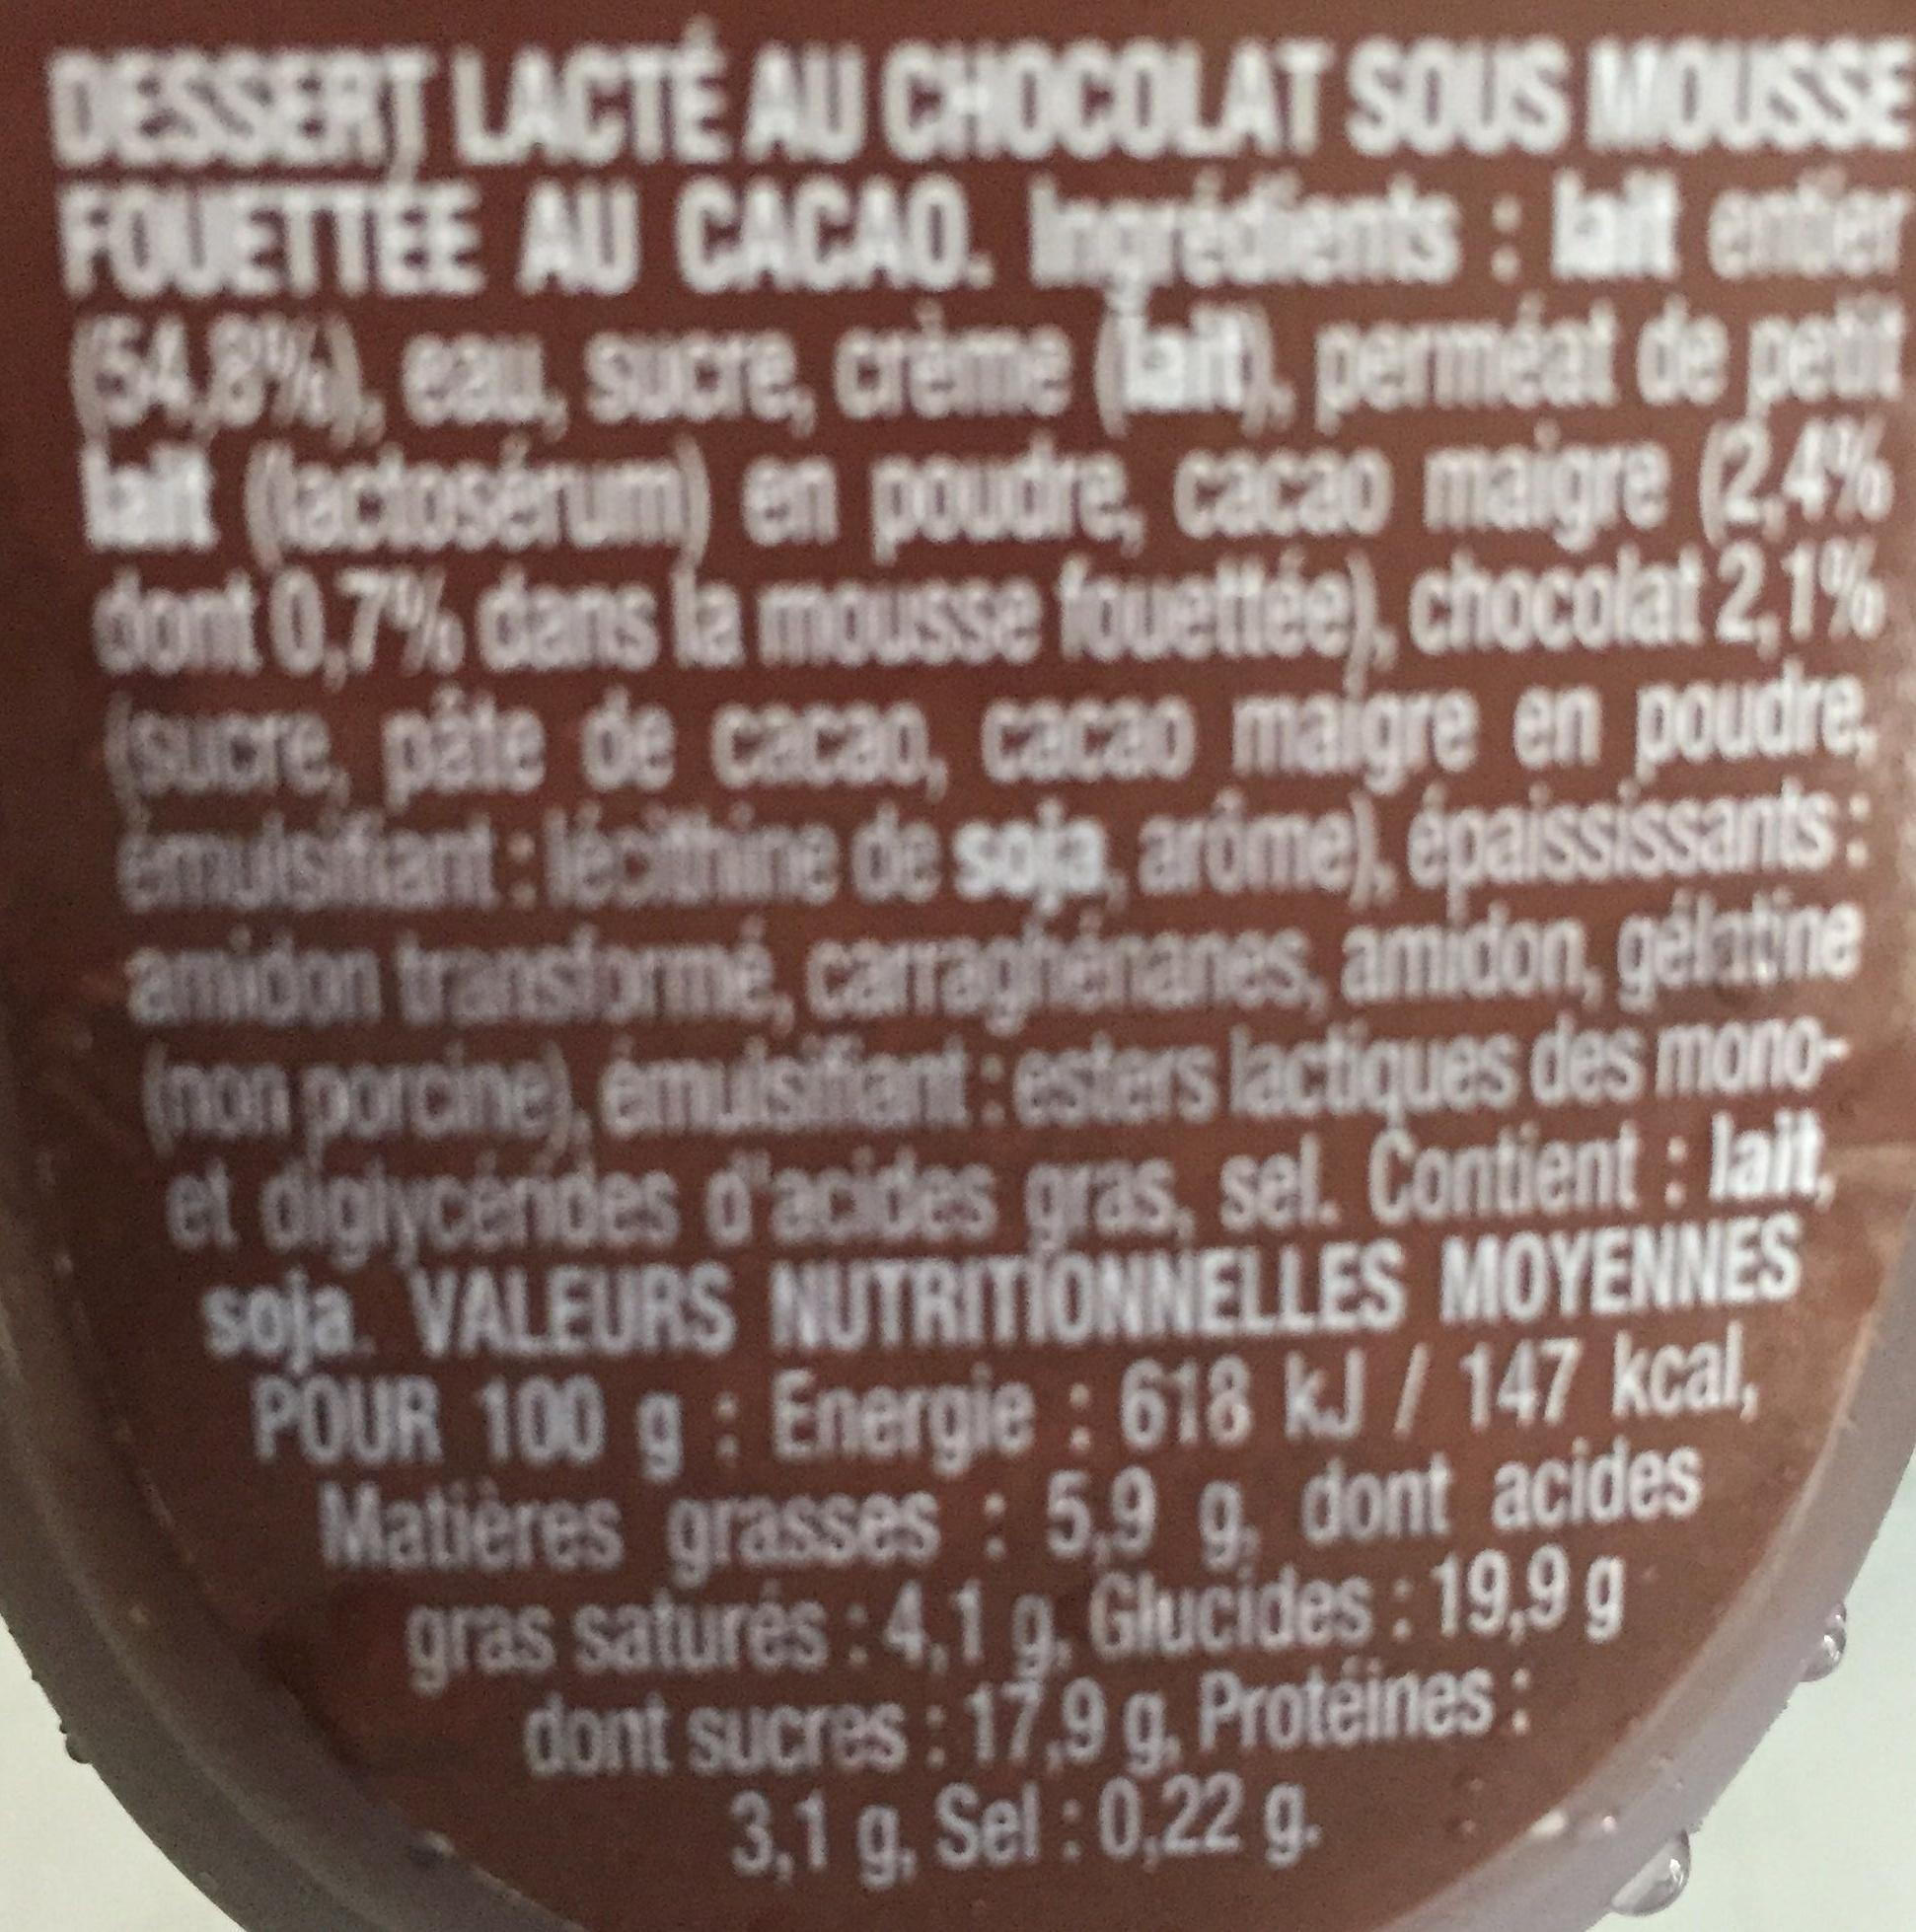 Danette (le Liégeois Chocolat) 4 pots - Ingrediënten - fr